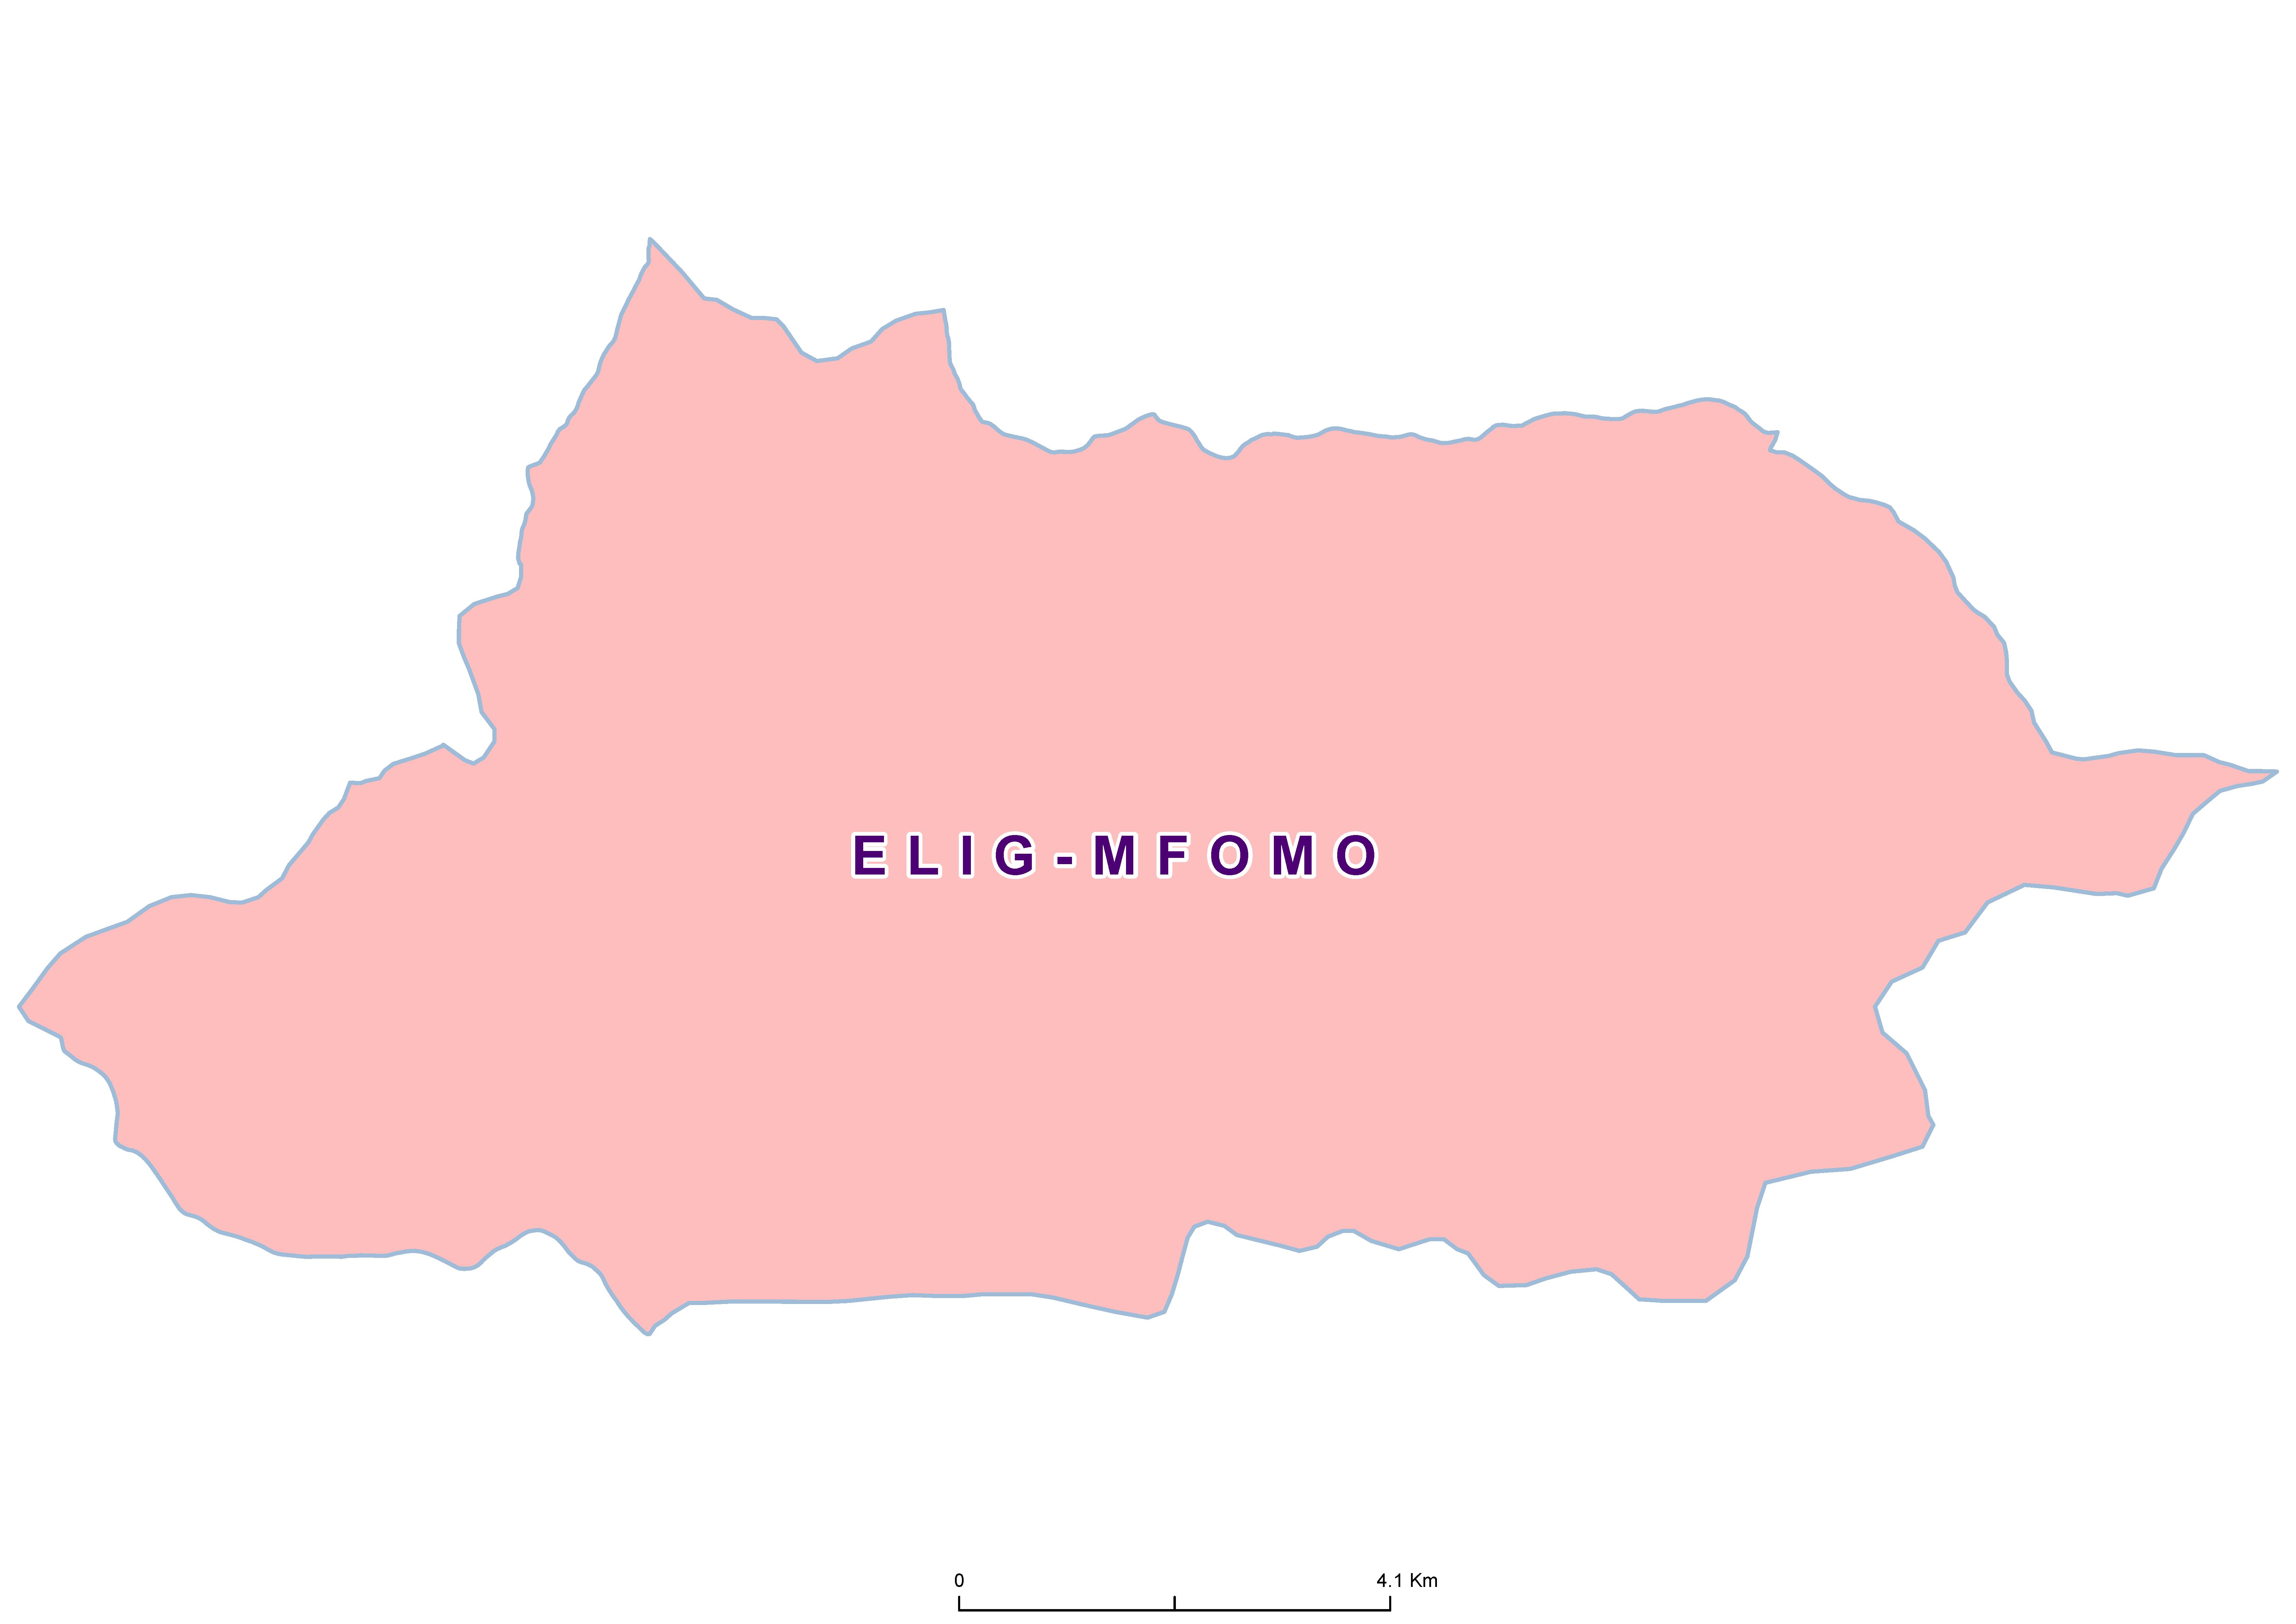 Elig-mfomo Mean SCH 20100001